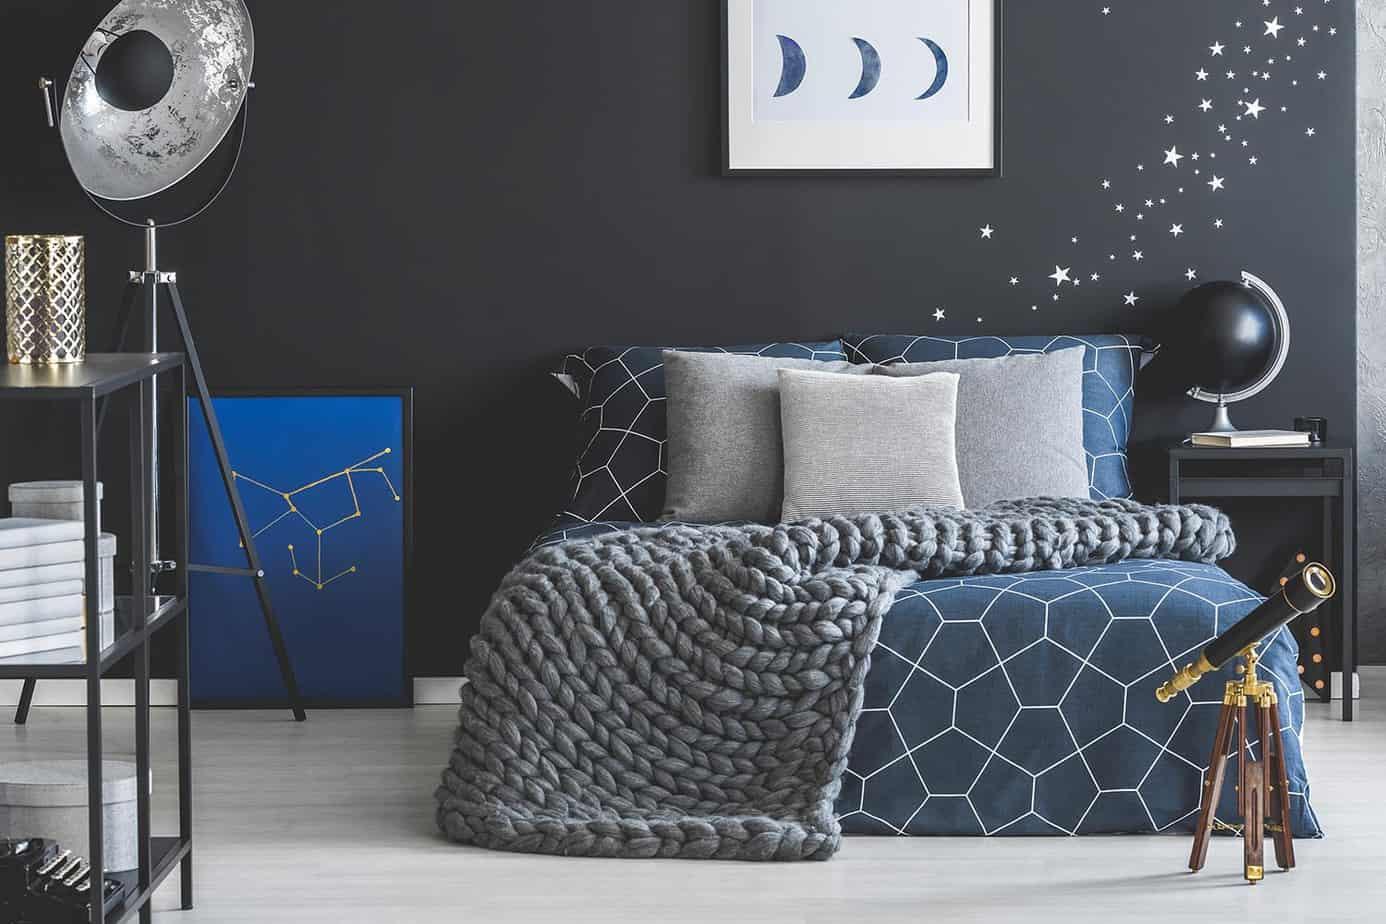 space theme boys bedroom design 2021